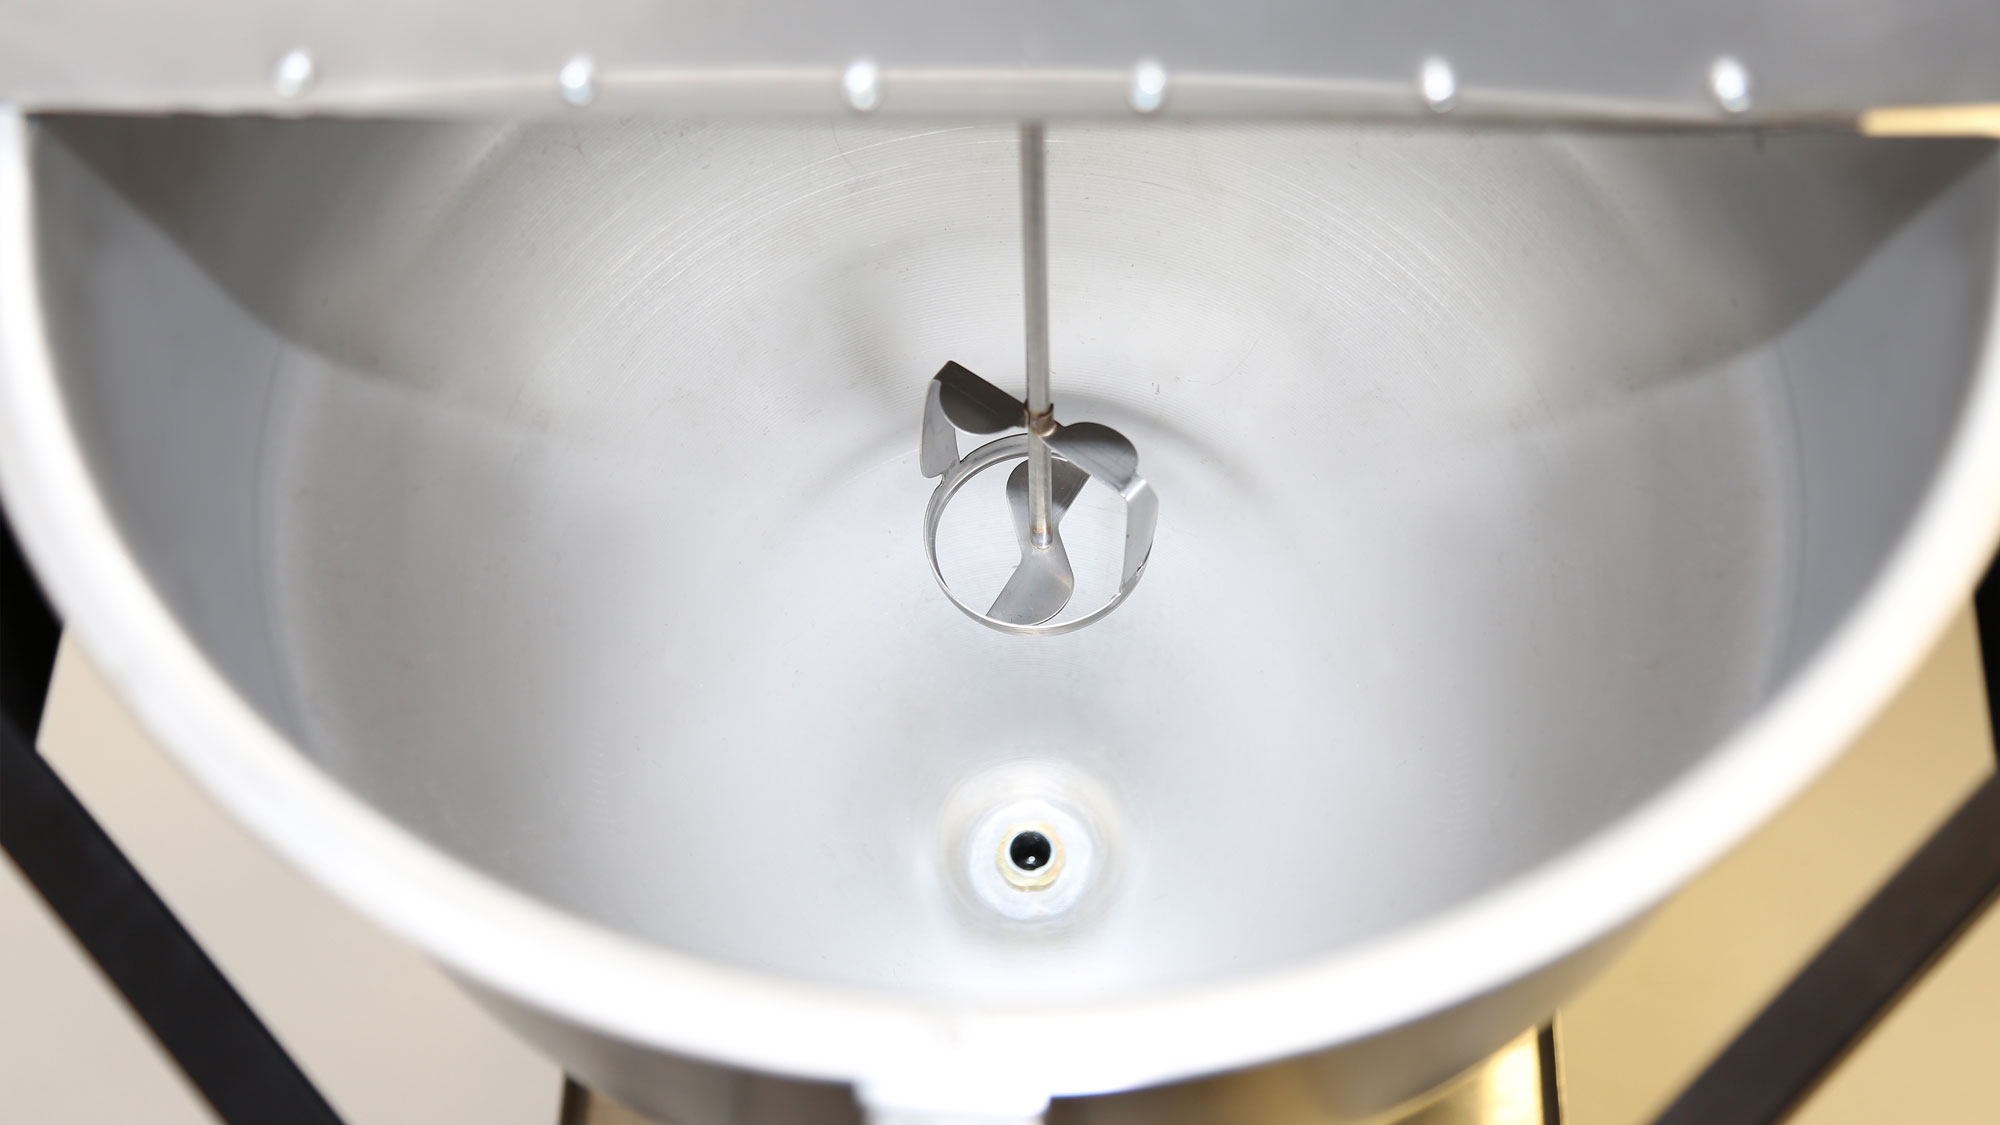 6.4 Gal stainless steel liquid Reservoir